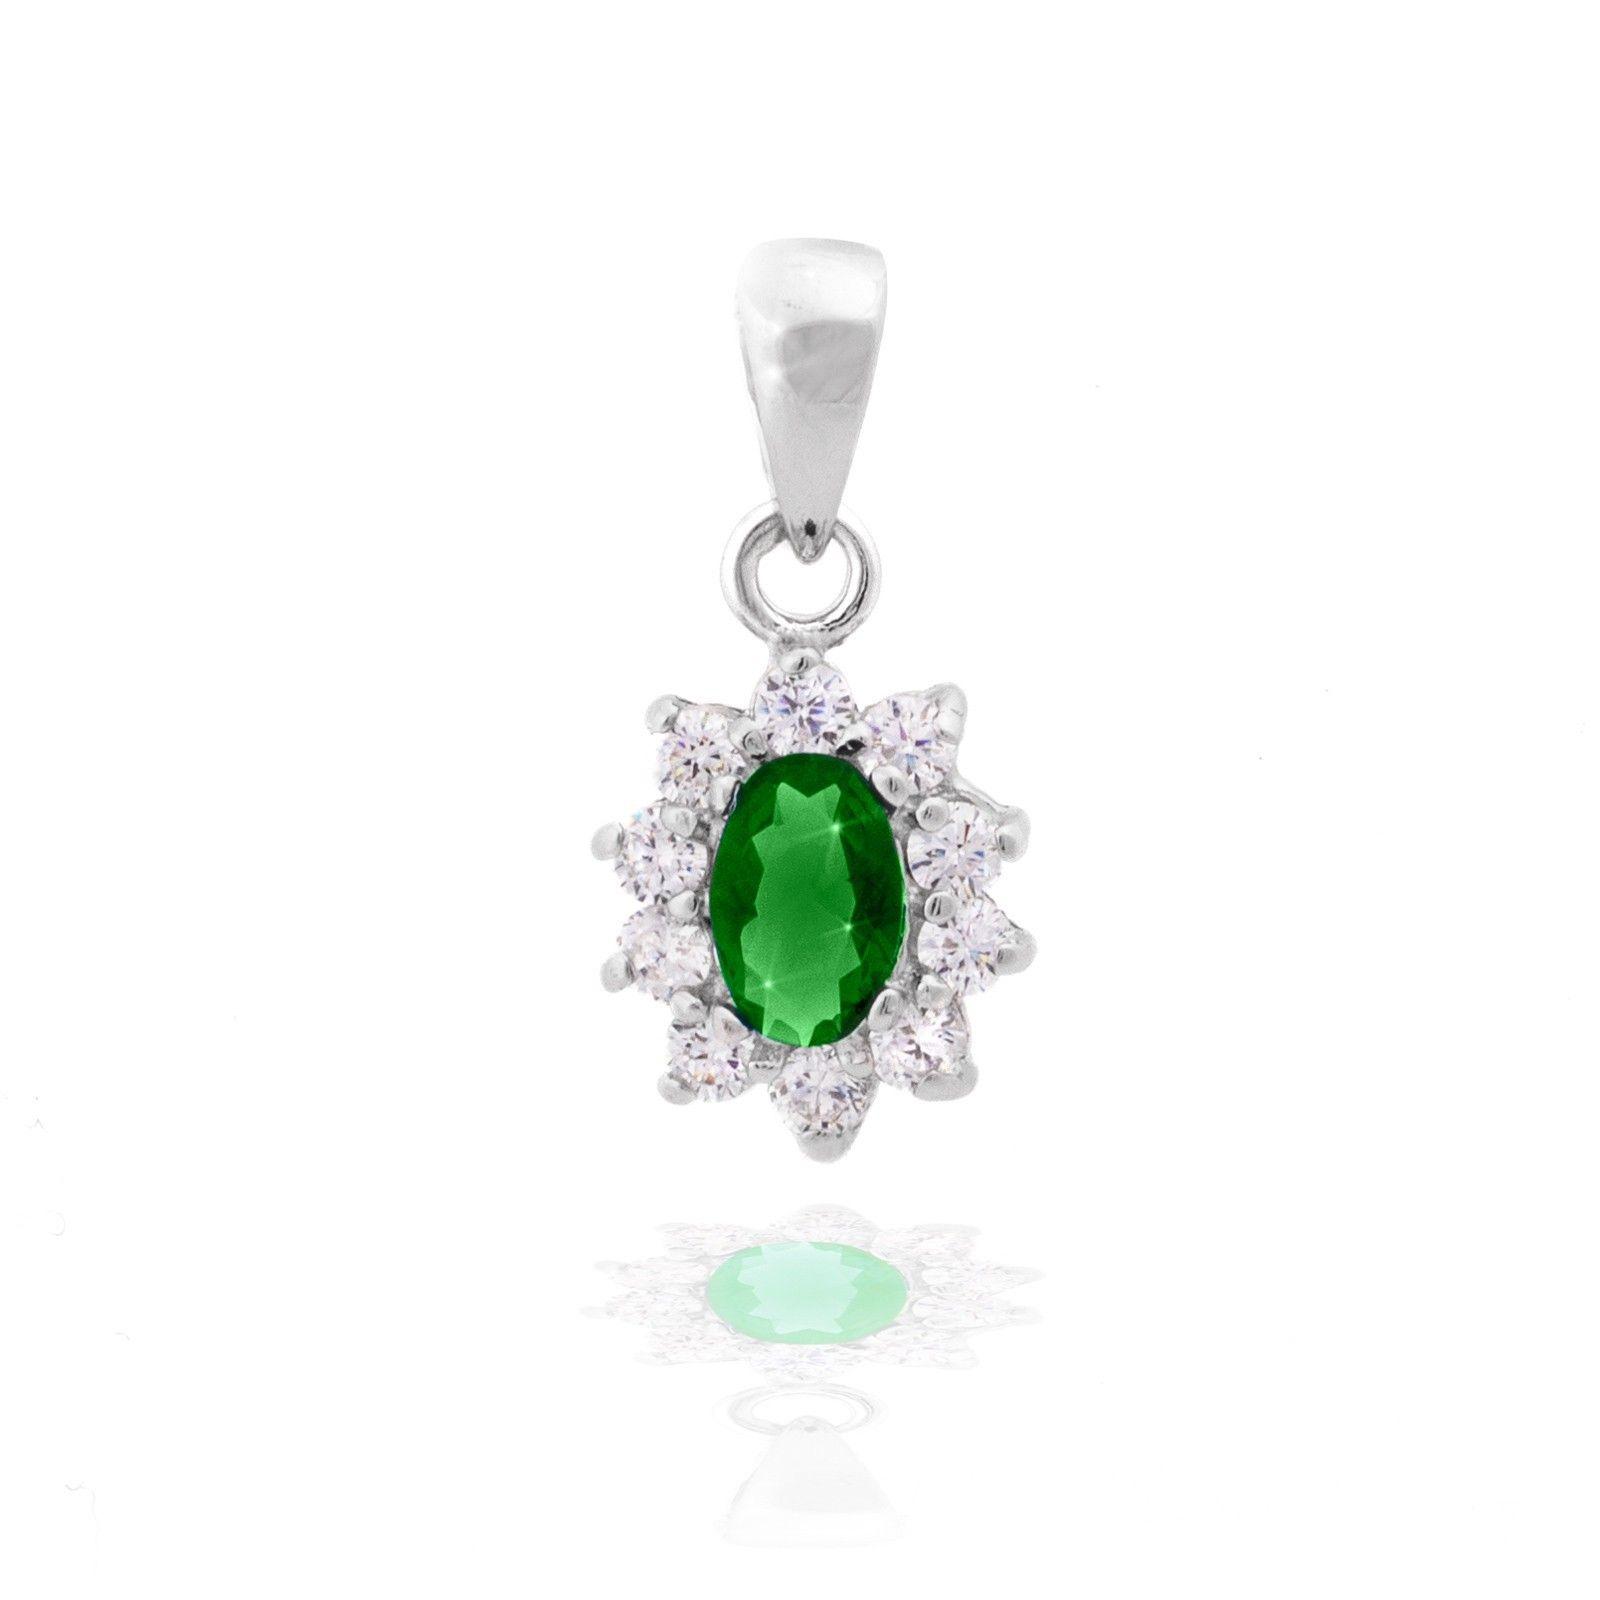 collier argent femme vert